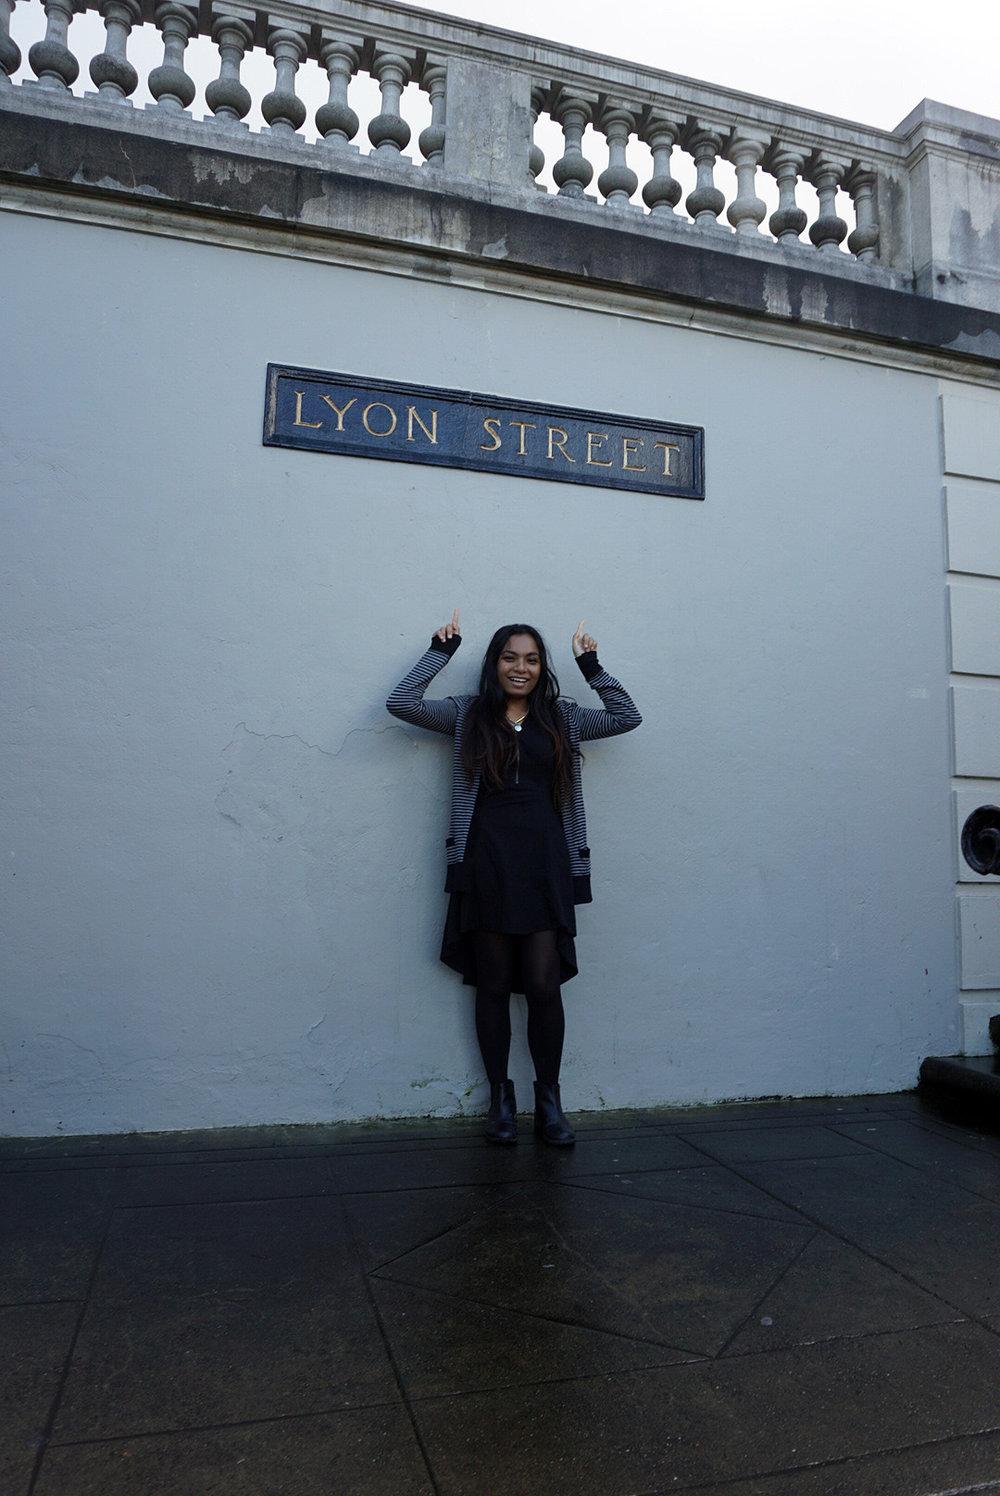 Lyon-Street-San-Francisco-California-Travel-LINDATENCHITRAN-13-1616X1080.jpg